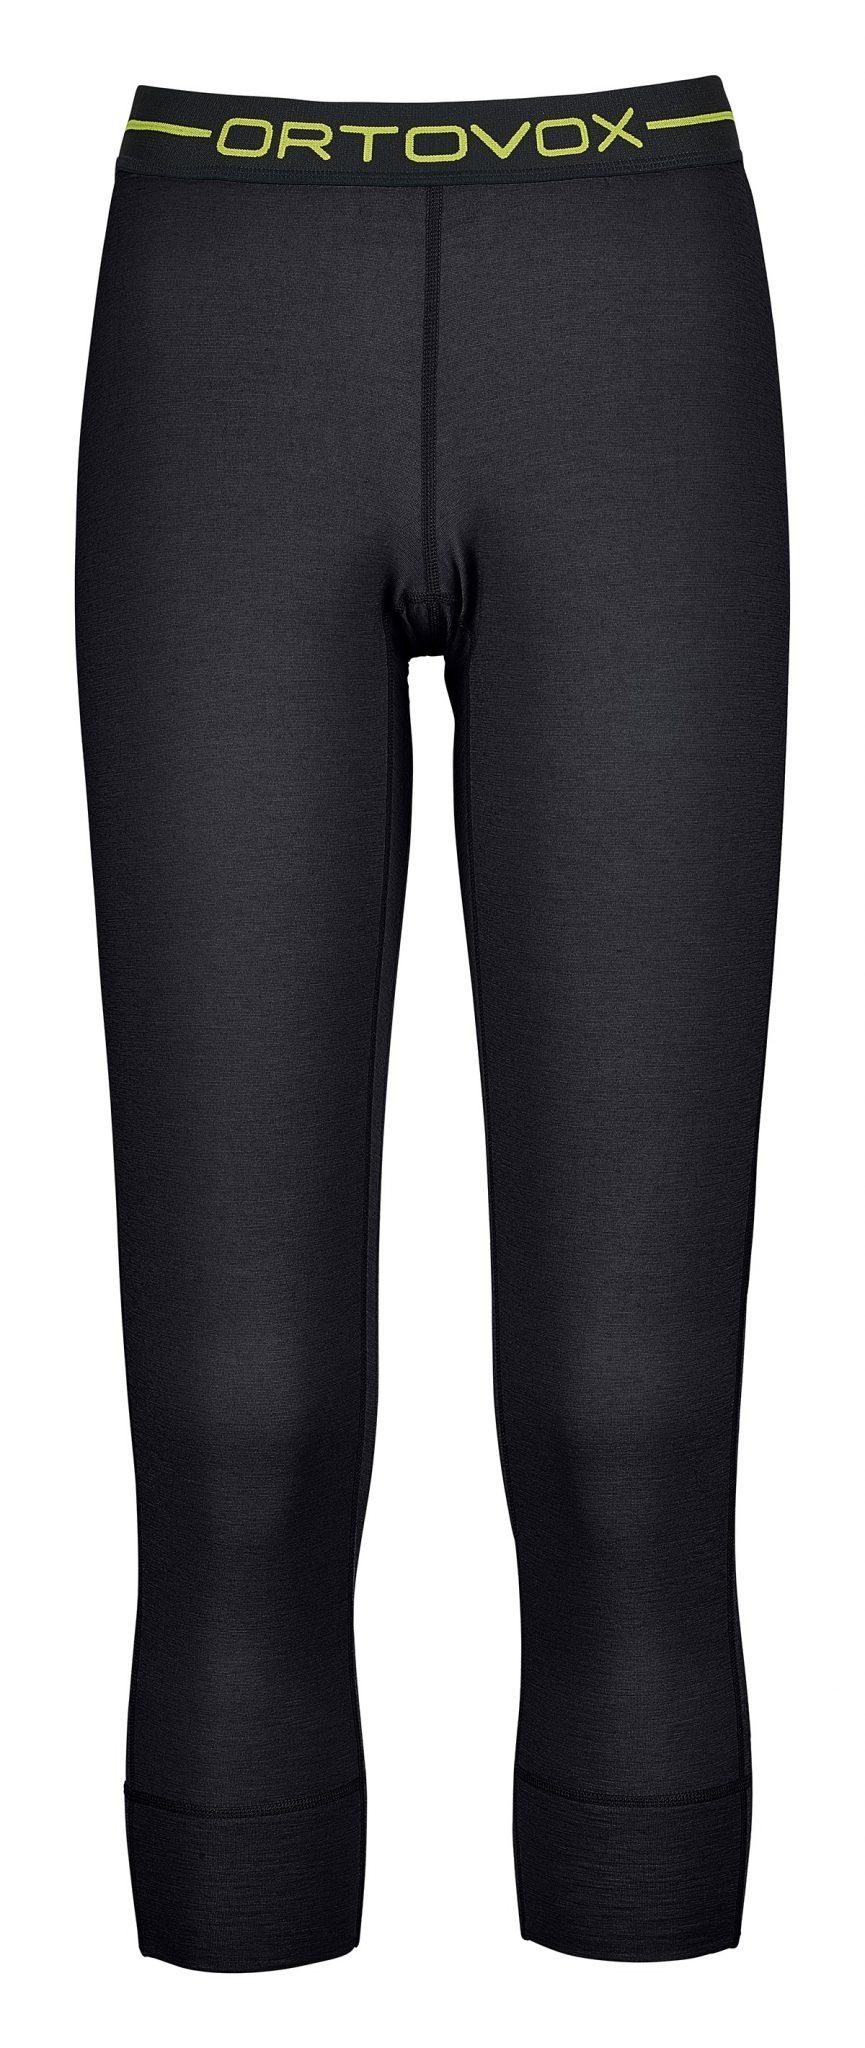 Ortovox Women's 145 Merino Ultra Short Pants - Black Raven